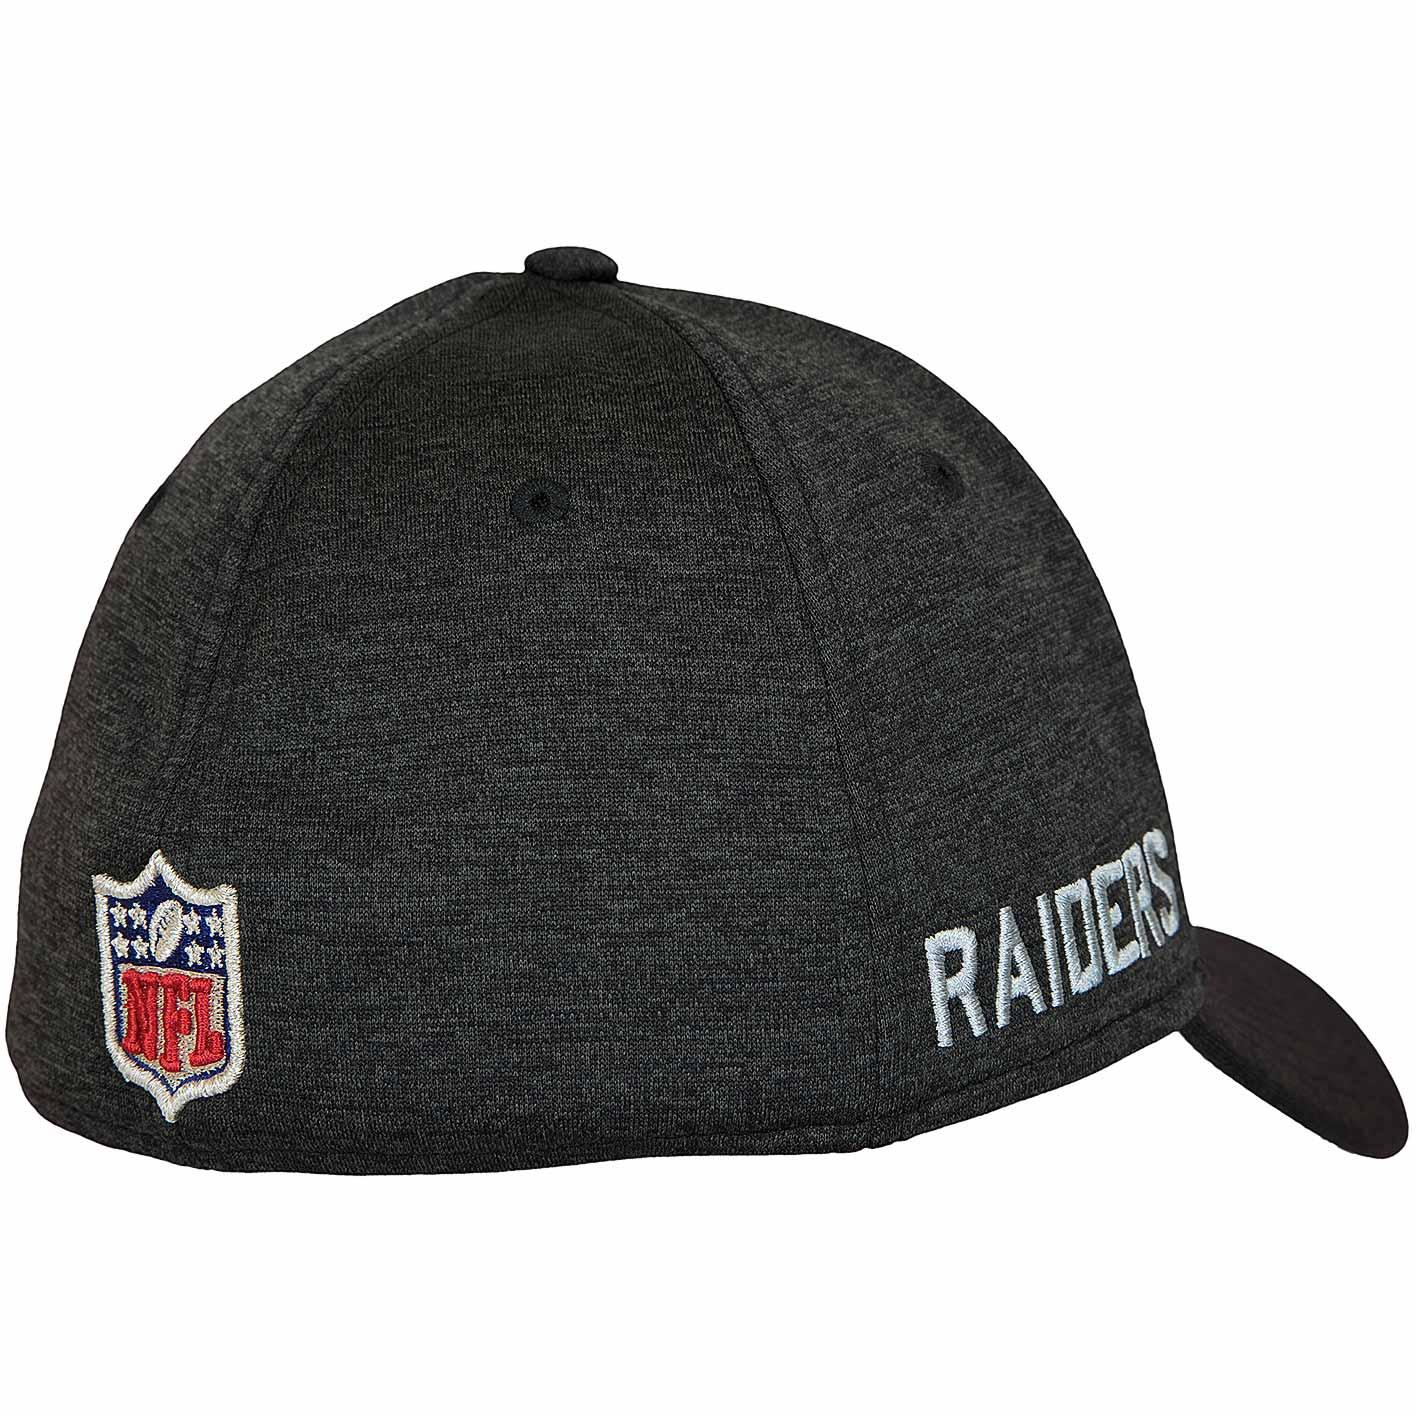 57ad218597023 ... where to buy new era 39thirty flexfit cap onfield road oakland raiders  schwarz grau 16f16 b24a2